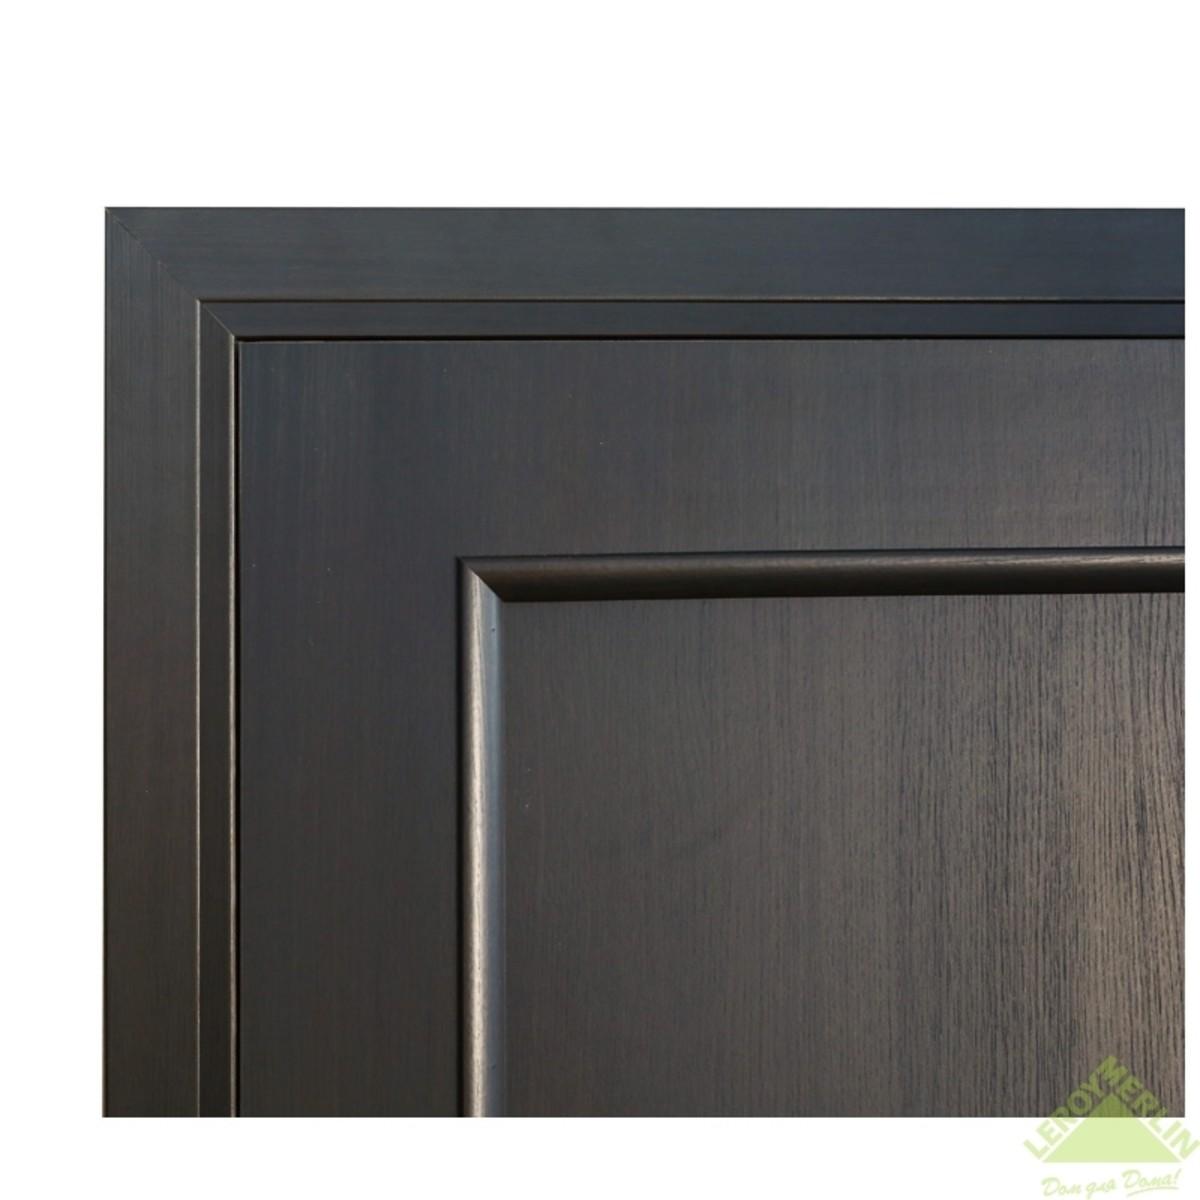 Дверь Межкомнатная Глухая Фортунато 820 900x2000 Венге